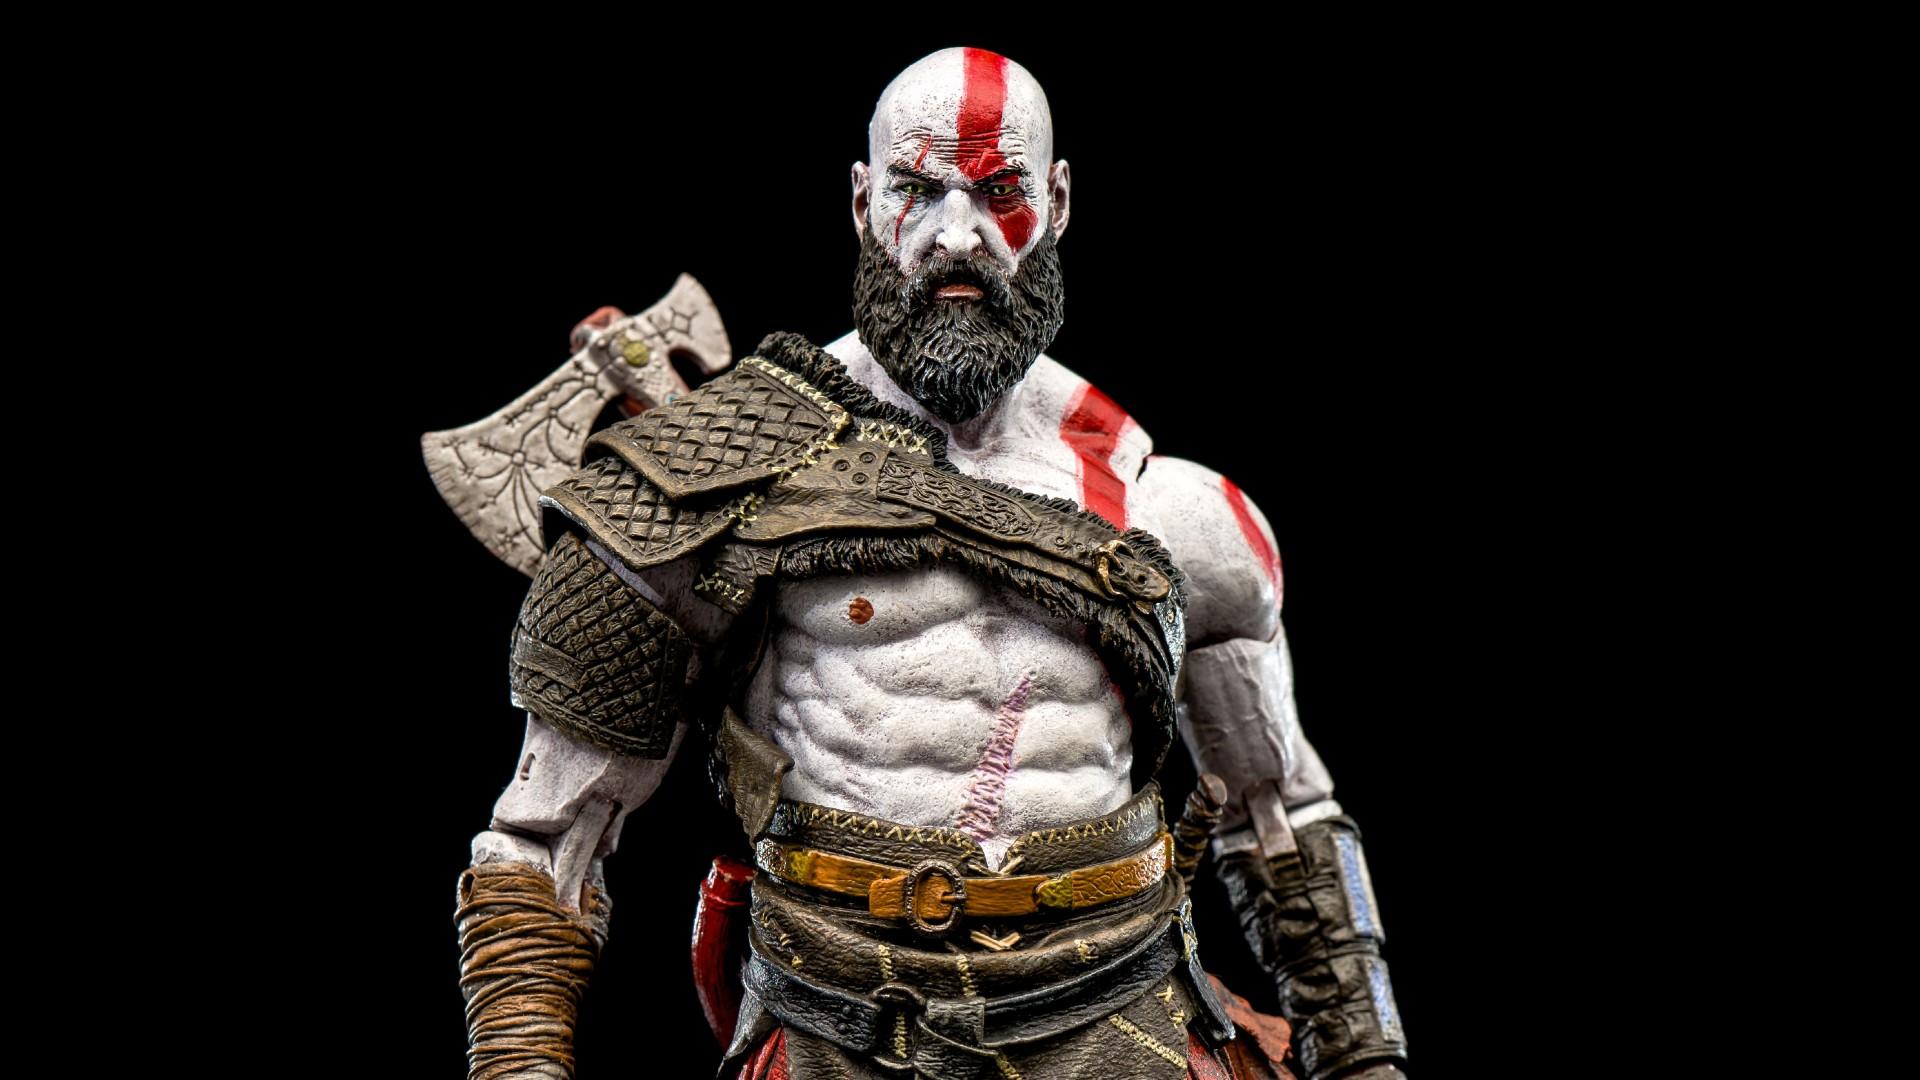 Kratos Wallpaper Hd 3d God Of War Kratos 2018 4k Wallpapers Hd Wallpapers Id